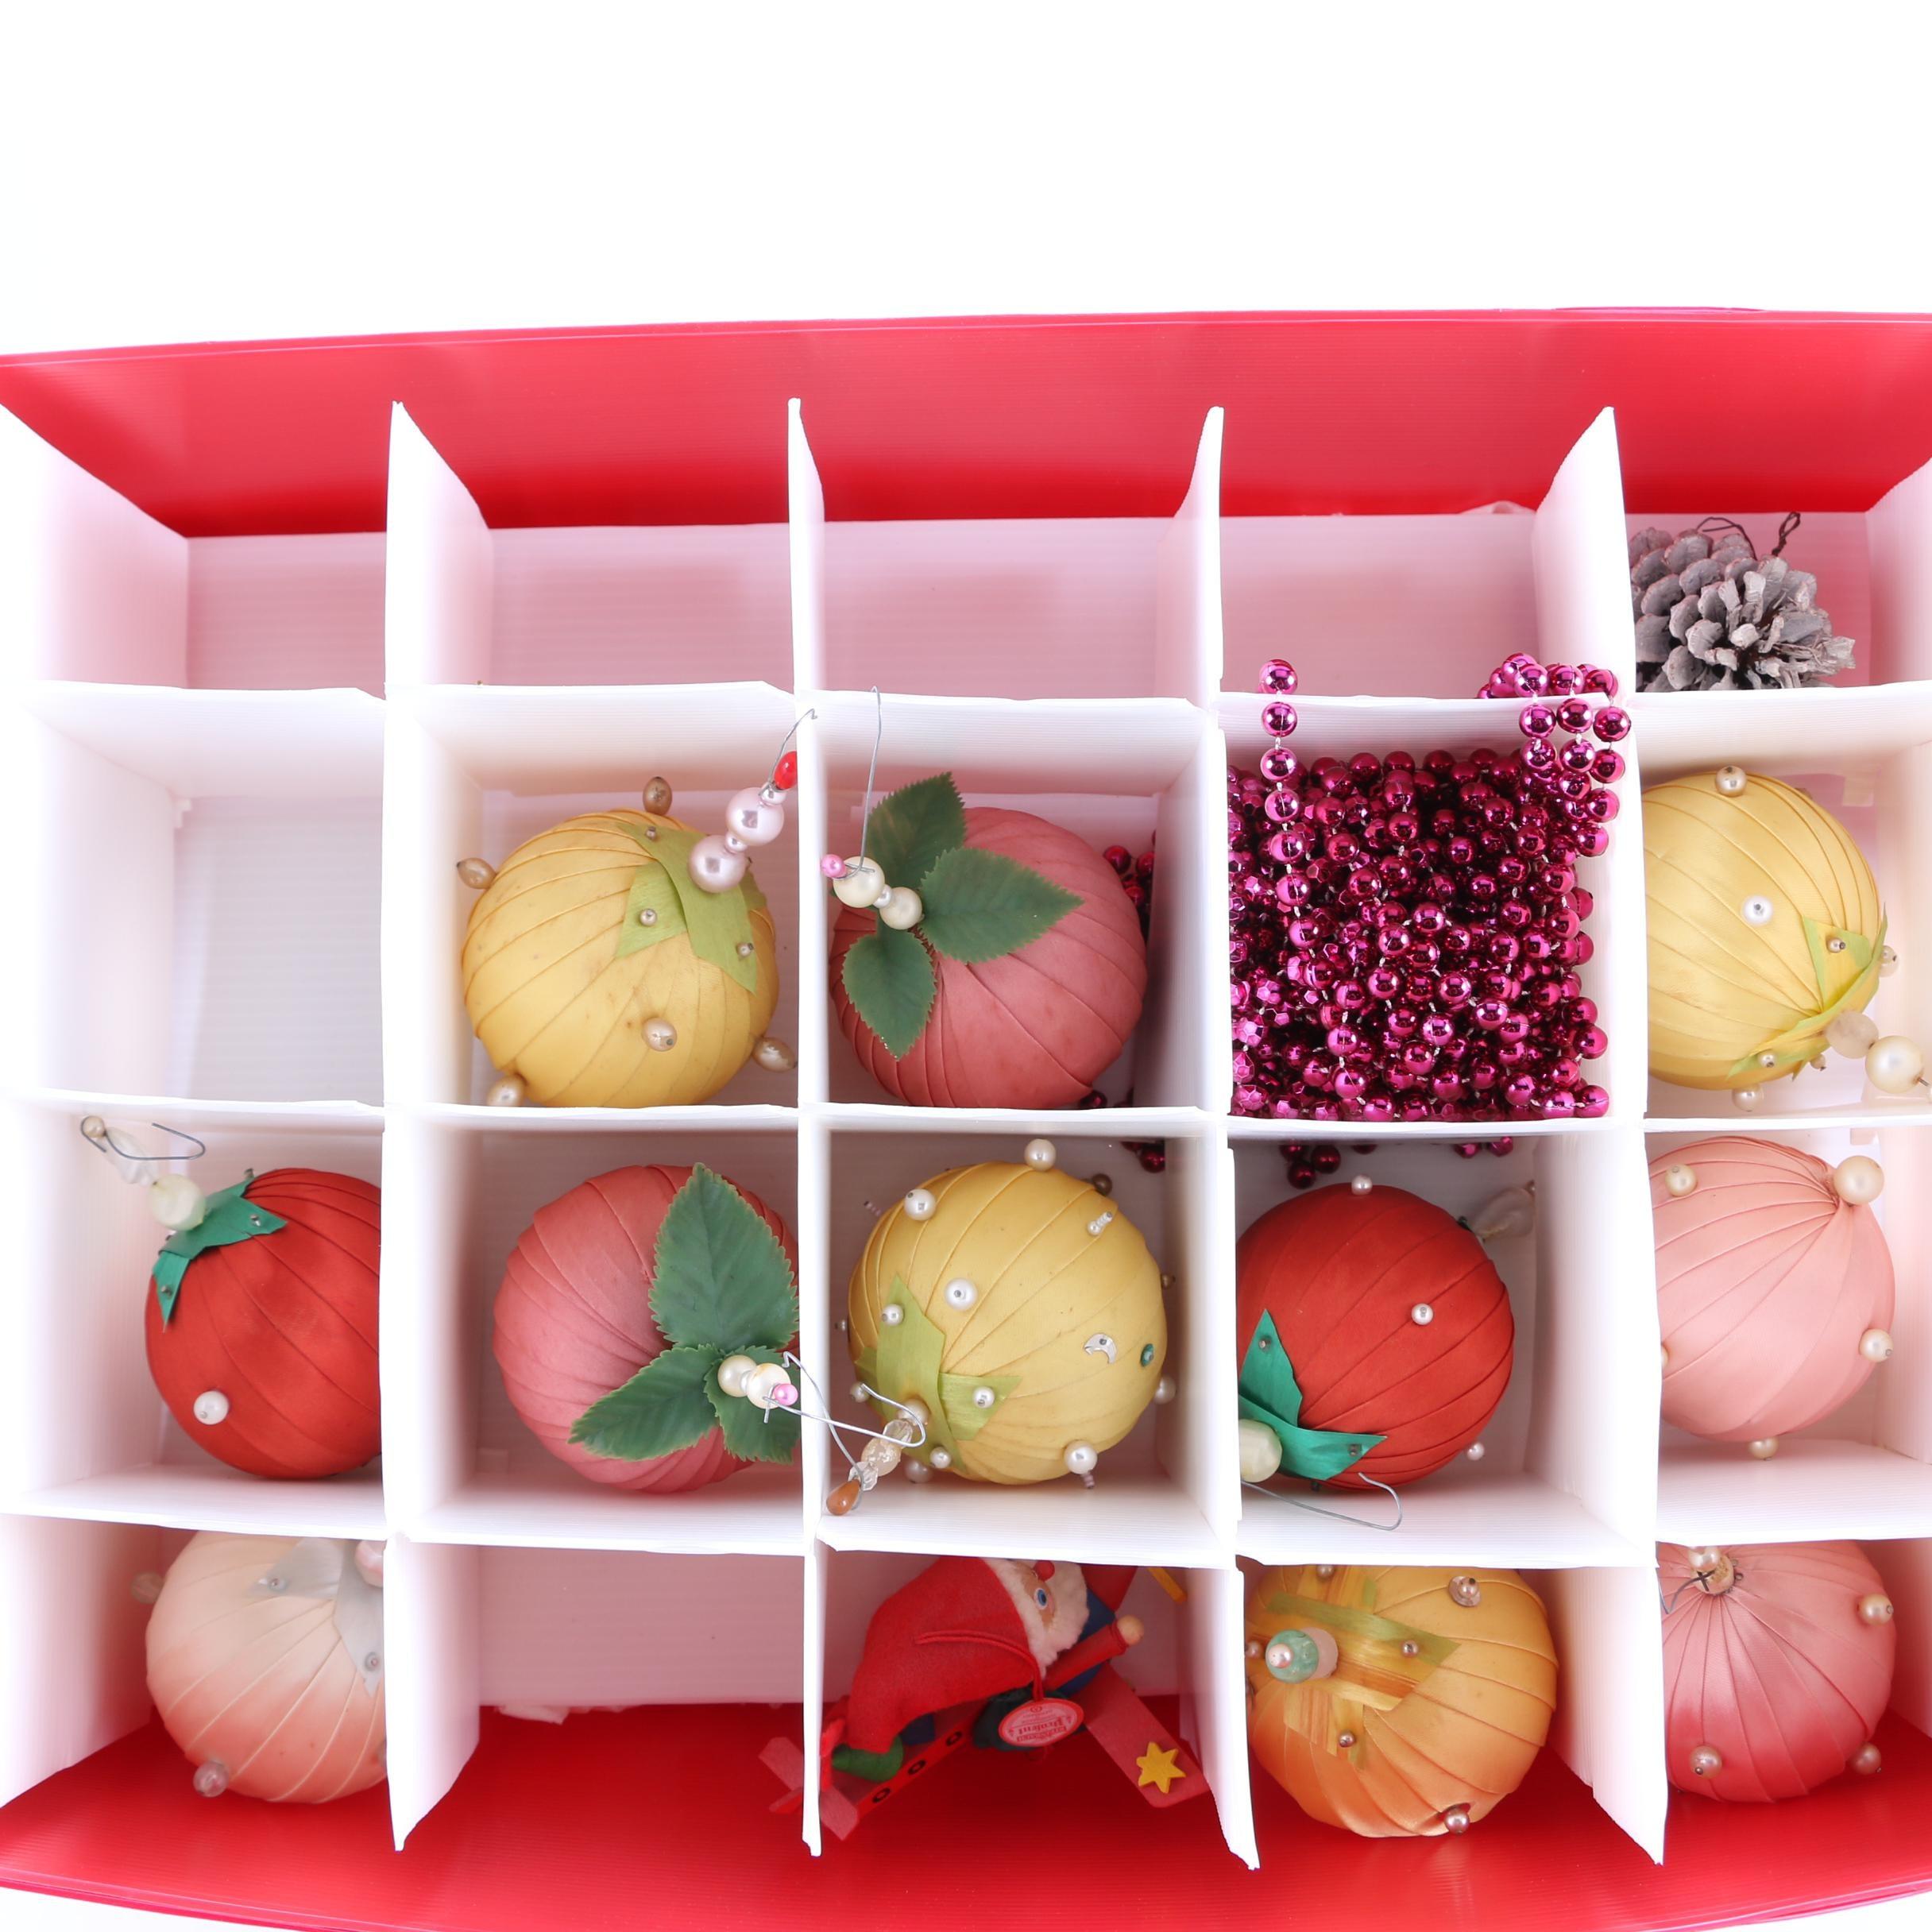 Vintage Handmade Christmas Ornaments in Segmented Storage Case